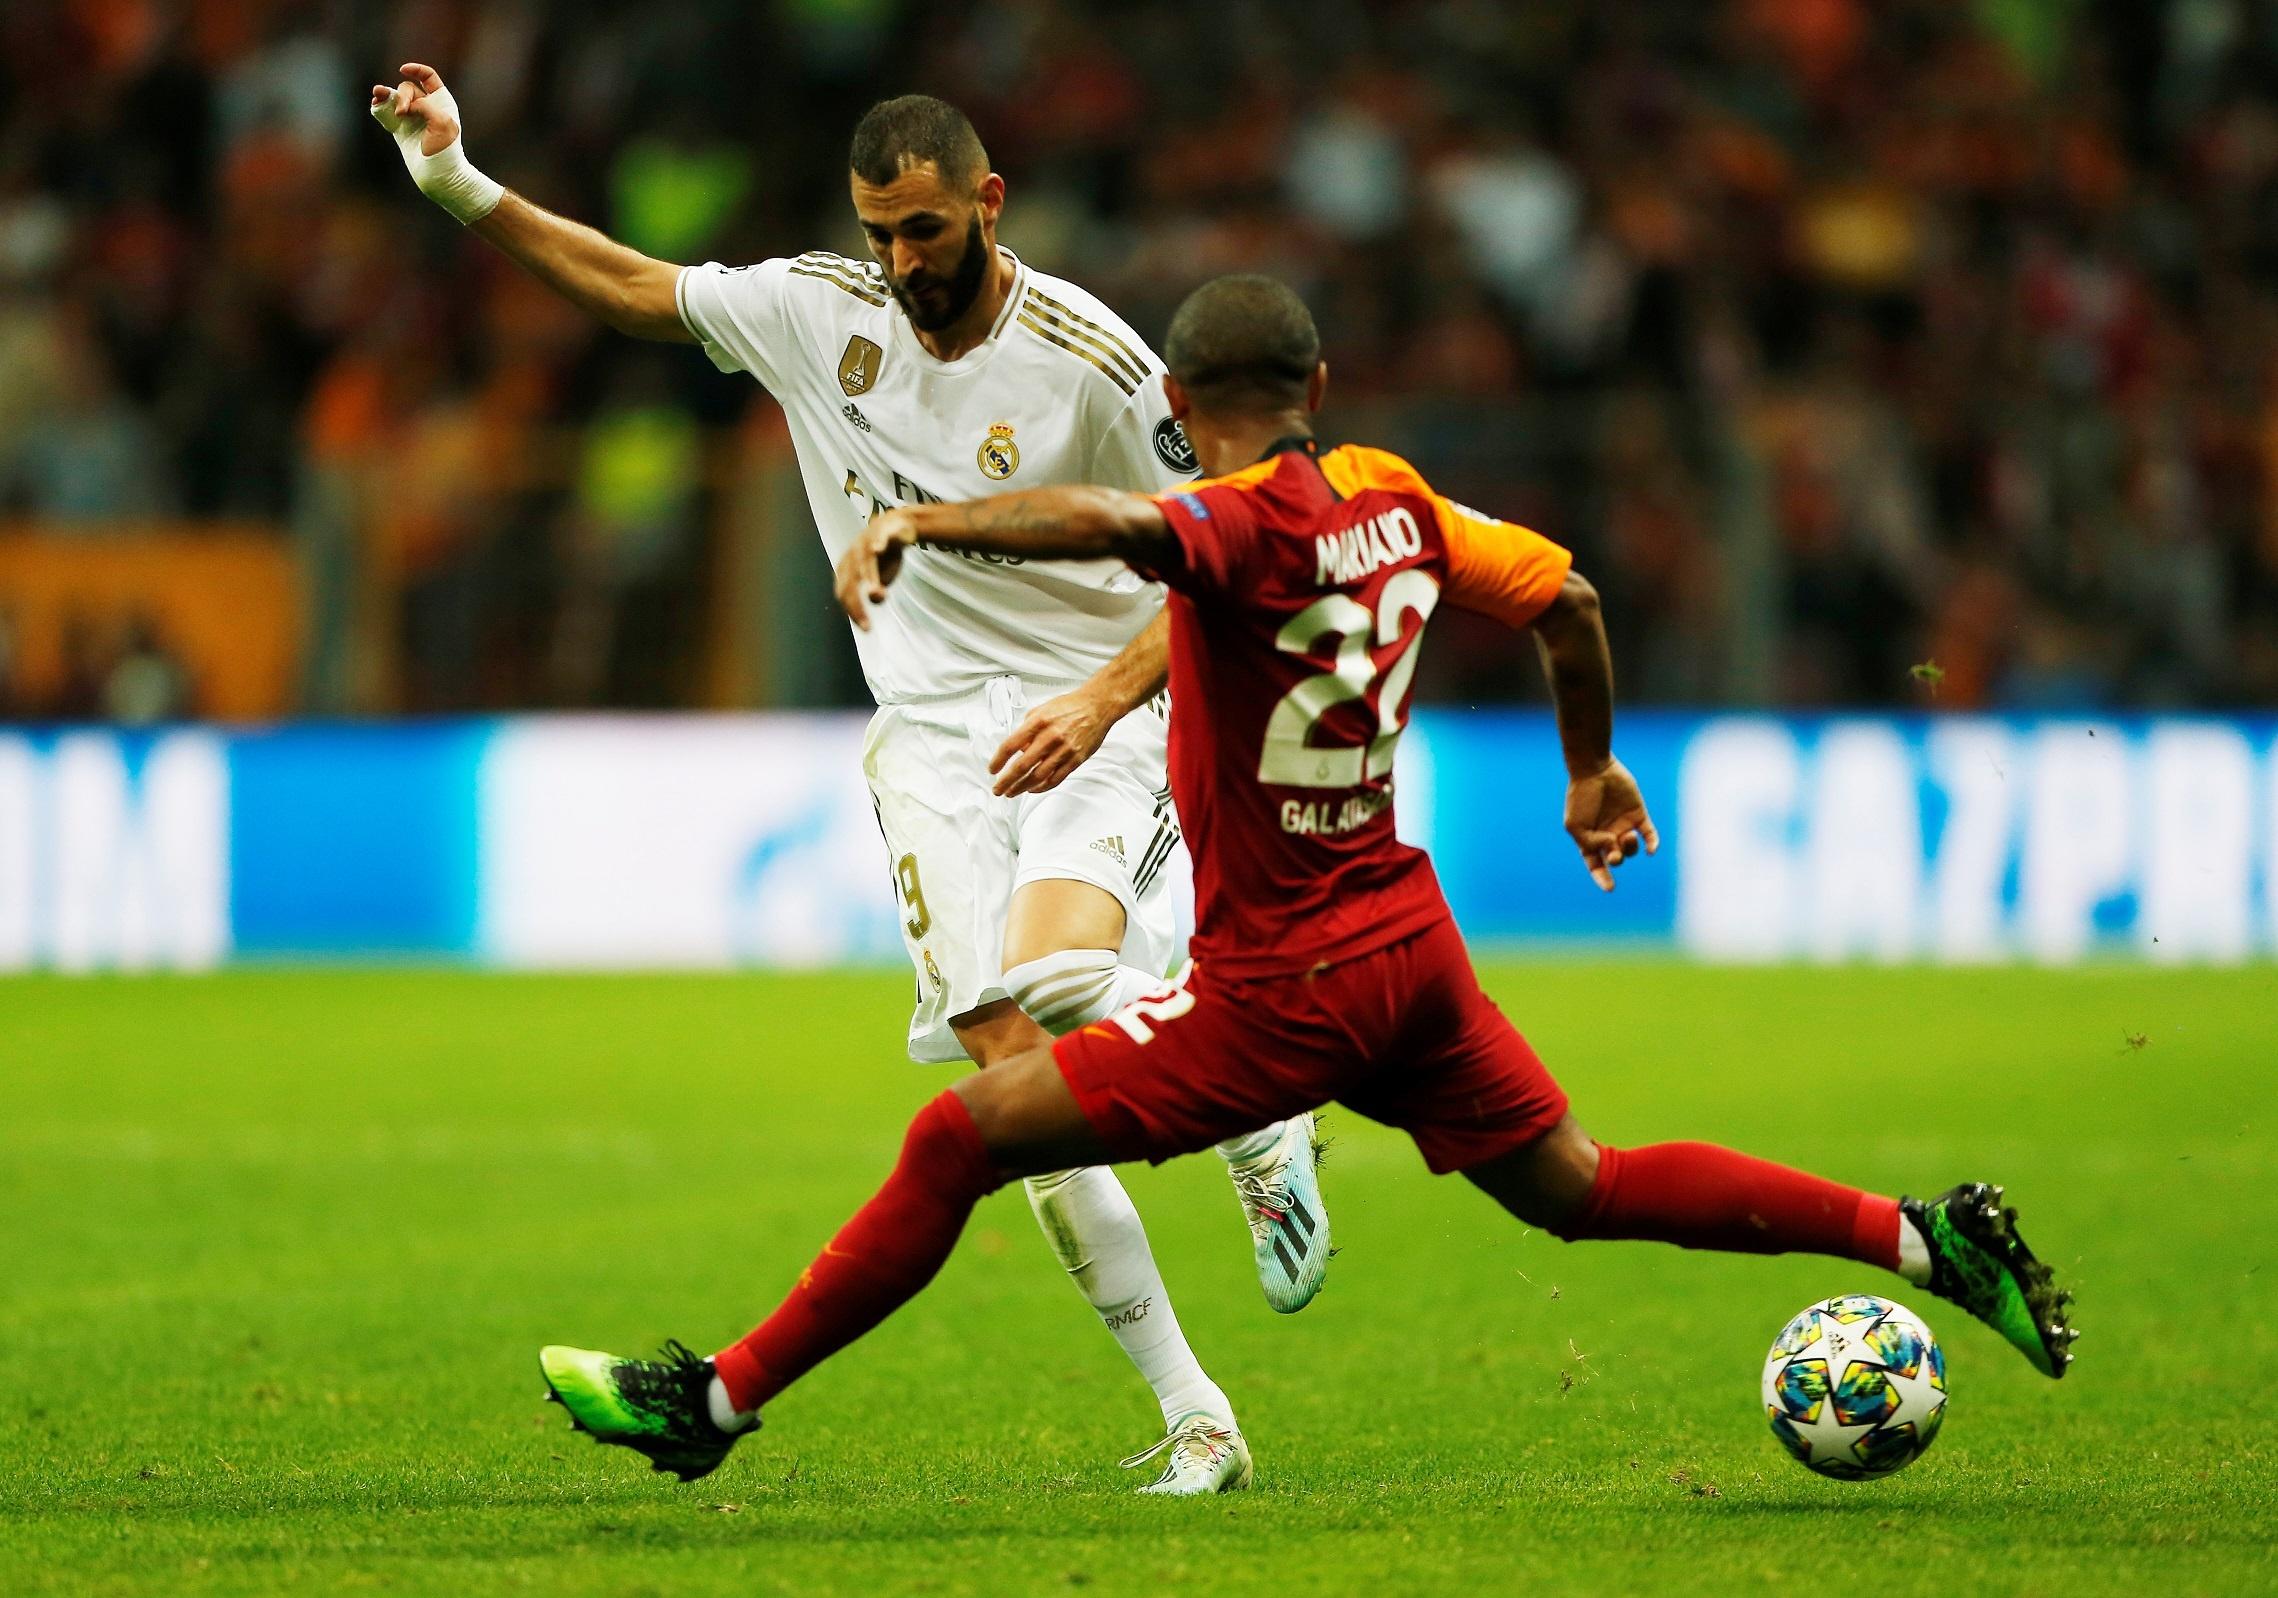 truc tiep Real Madrid va Galatasaray anh 15